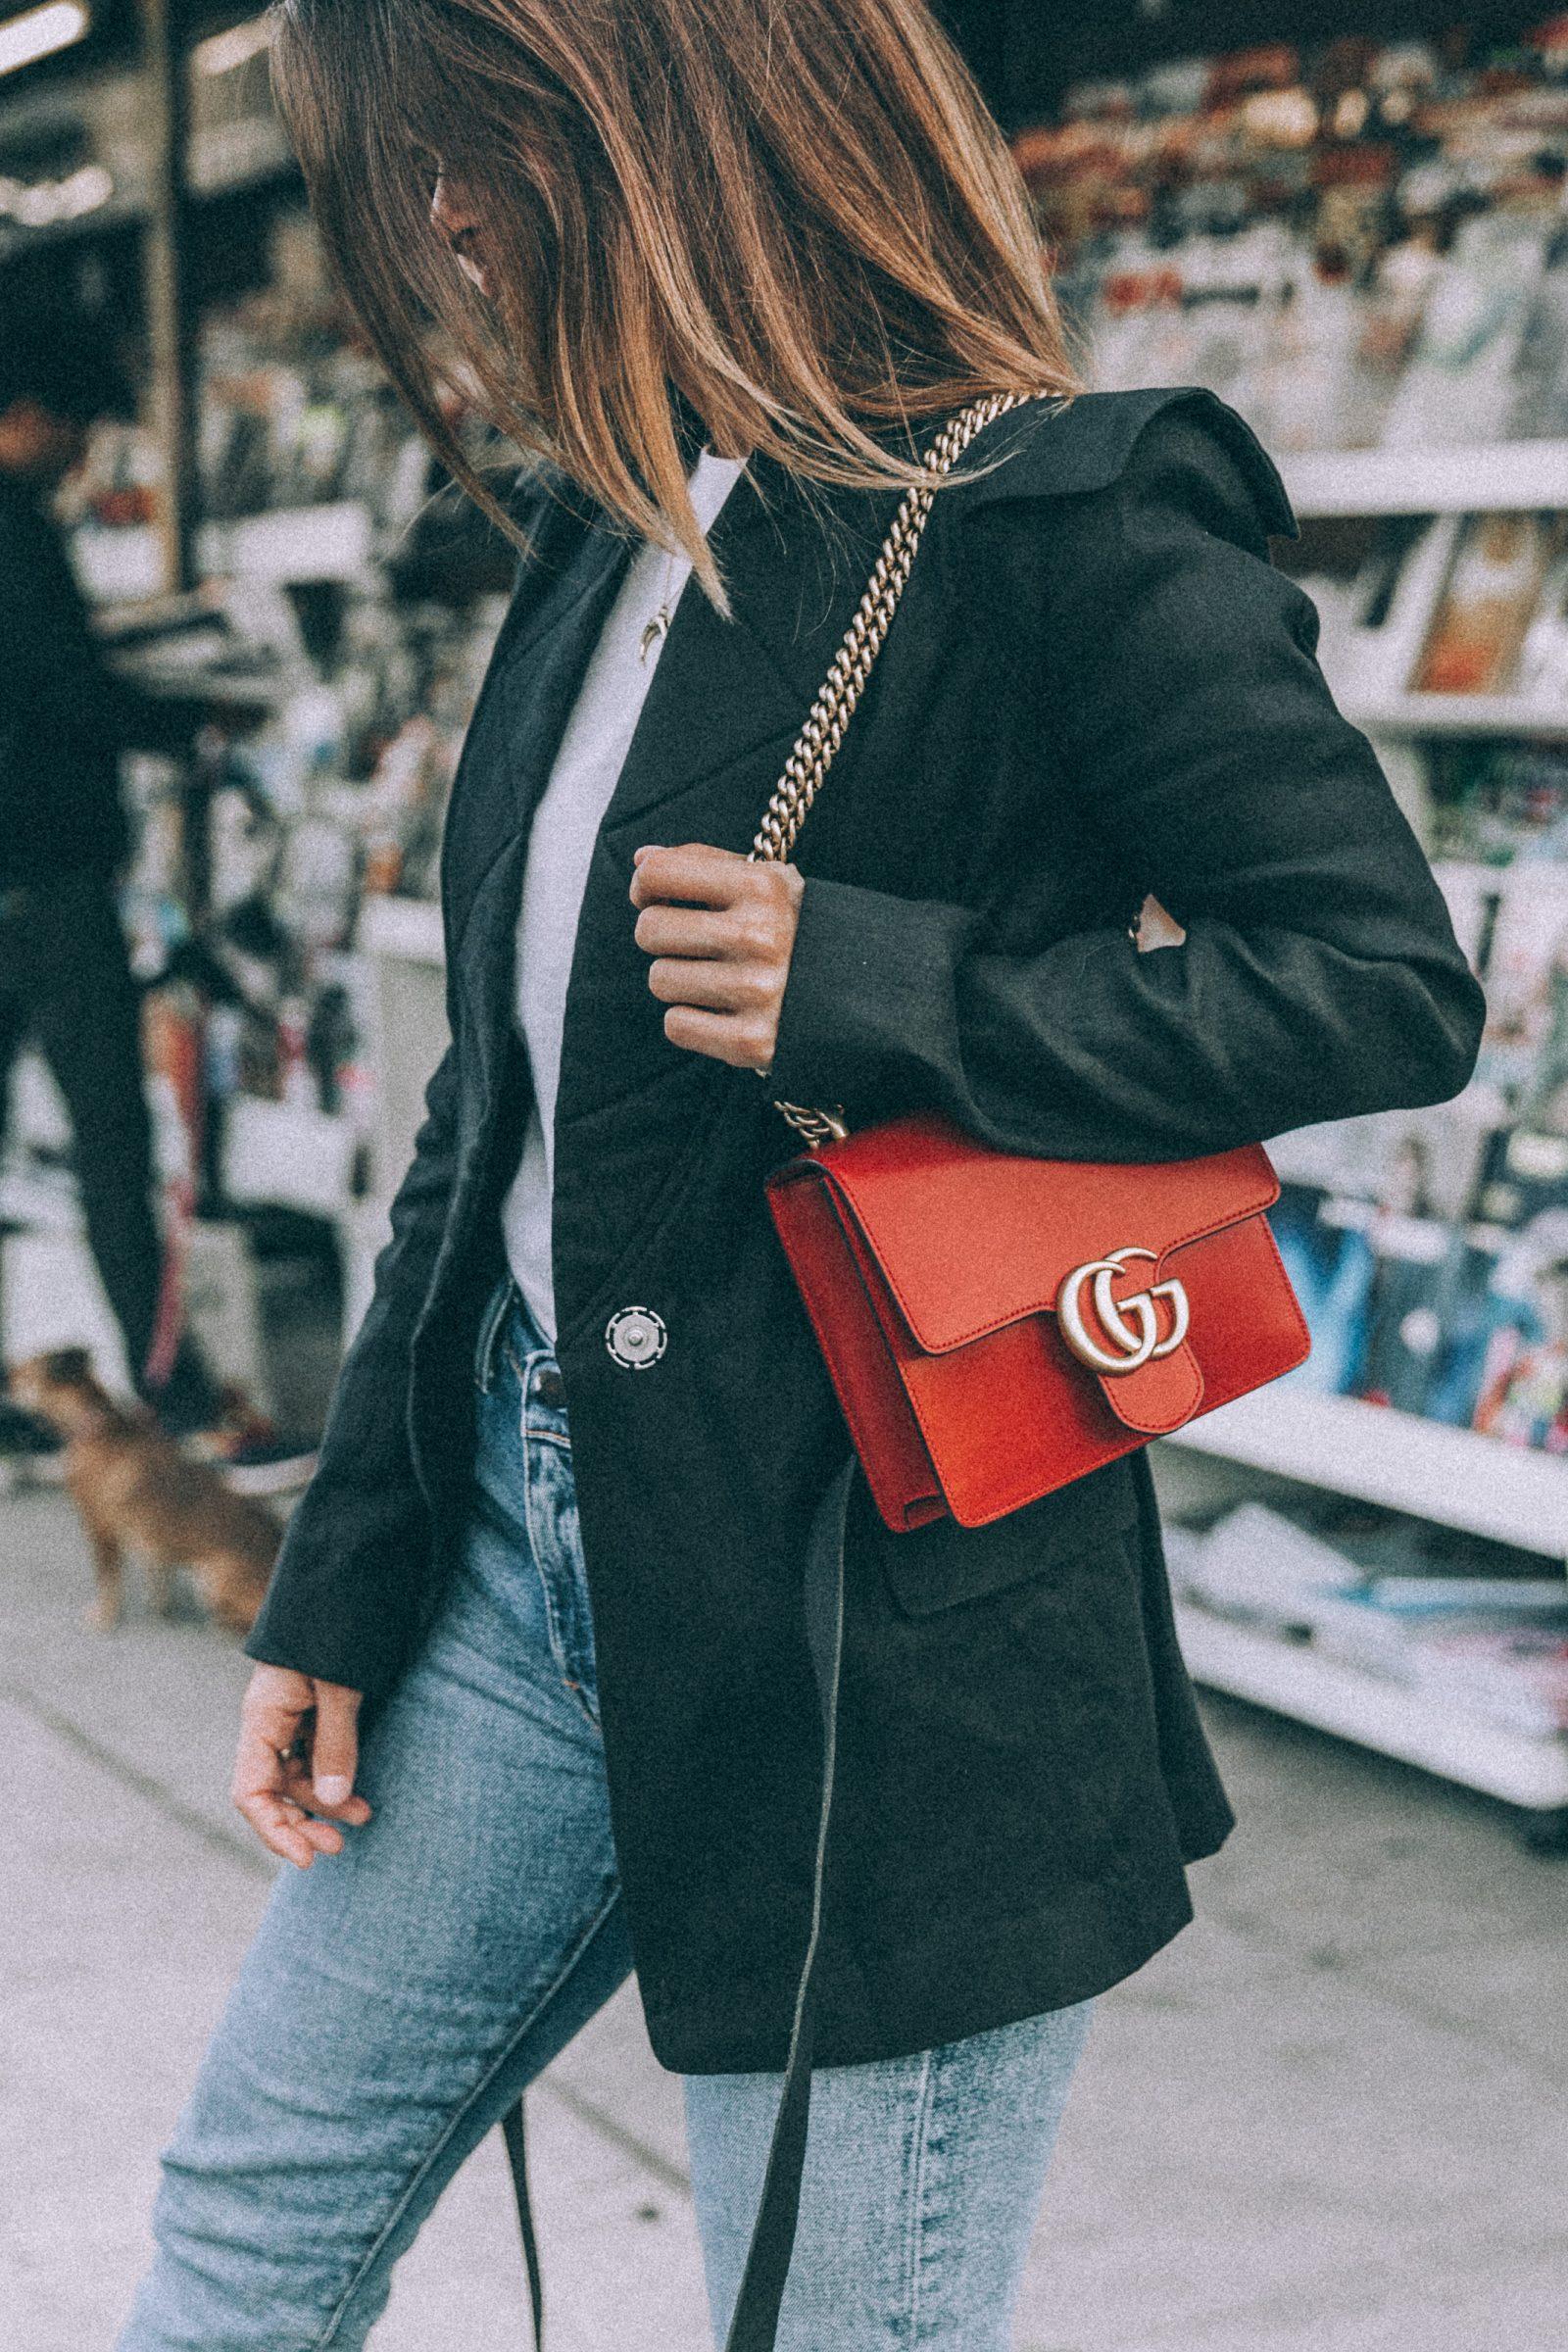 red_bag-snake_boots-gucci-levis-jeans-denim-iro_paris-black_blazer-los_angeles-la-fairfax-outfit-street_style-collage_vintage-7